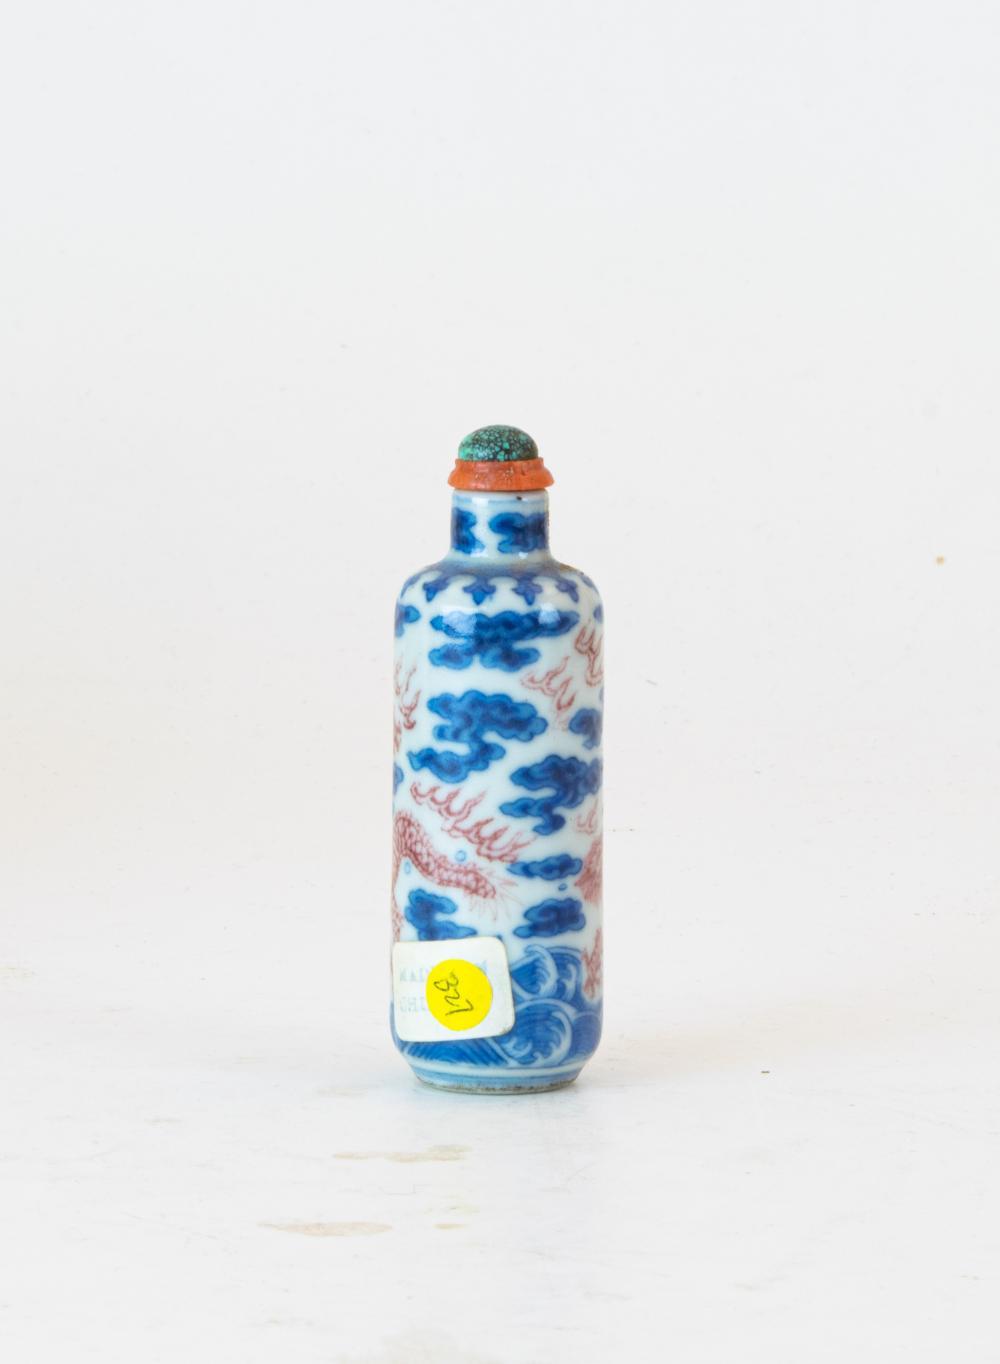 Lot 661: CHINESE BLUE & RED UNDERGLAZE SNUFF BOTTLE,18TH CENTURY